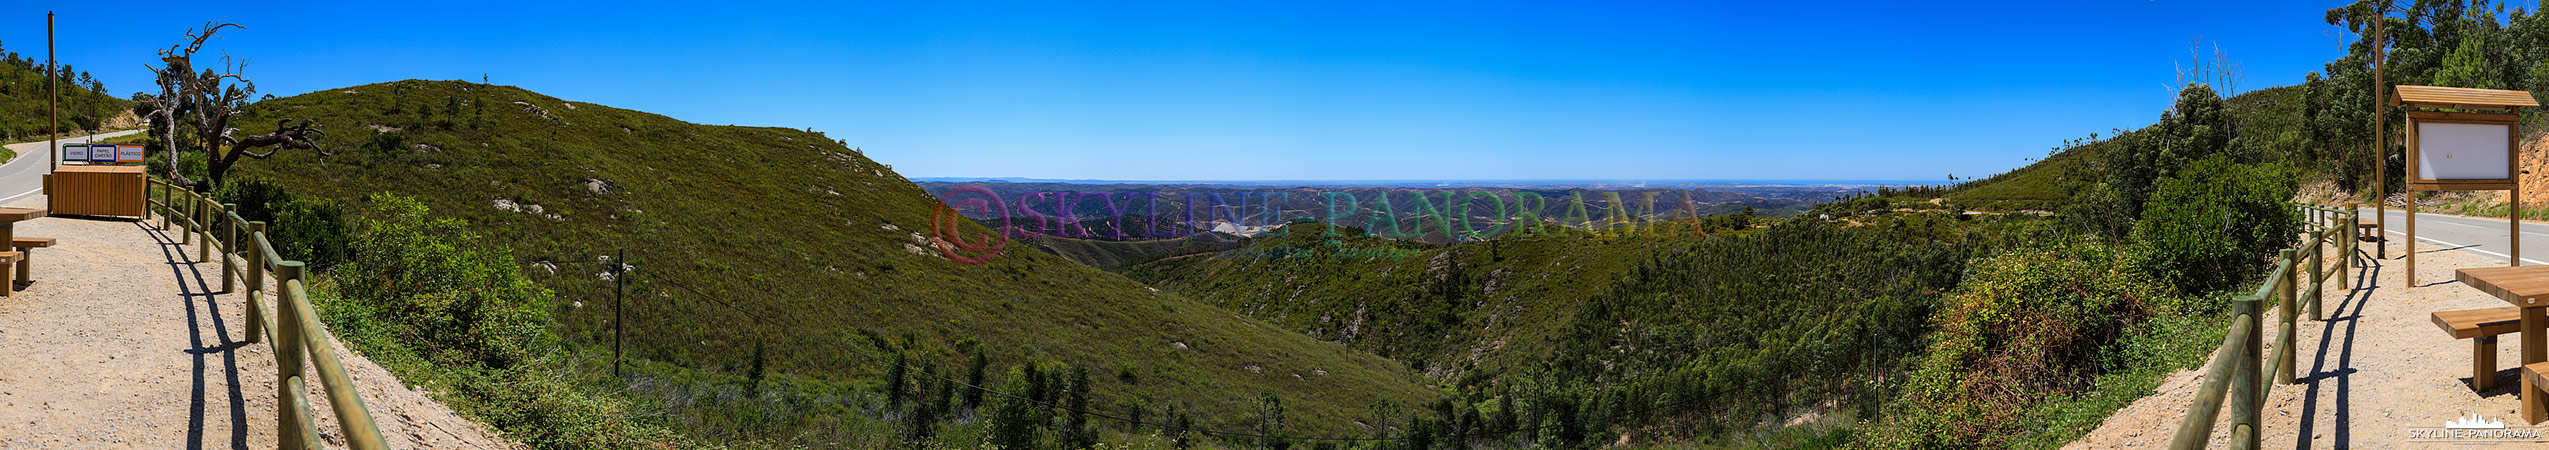 Monchiquegebirge Portugal